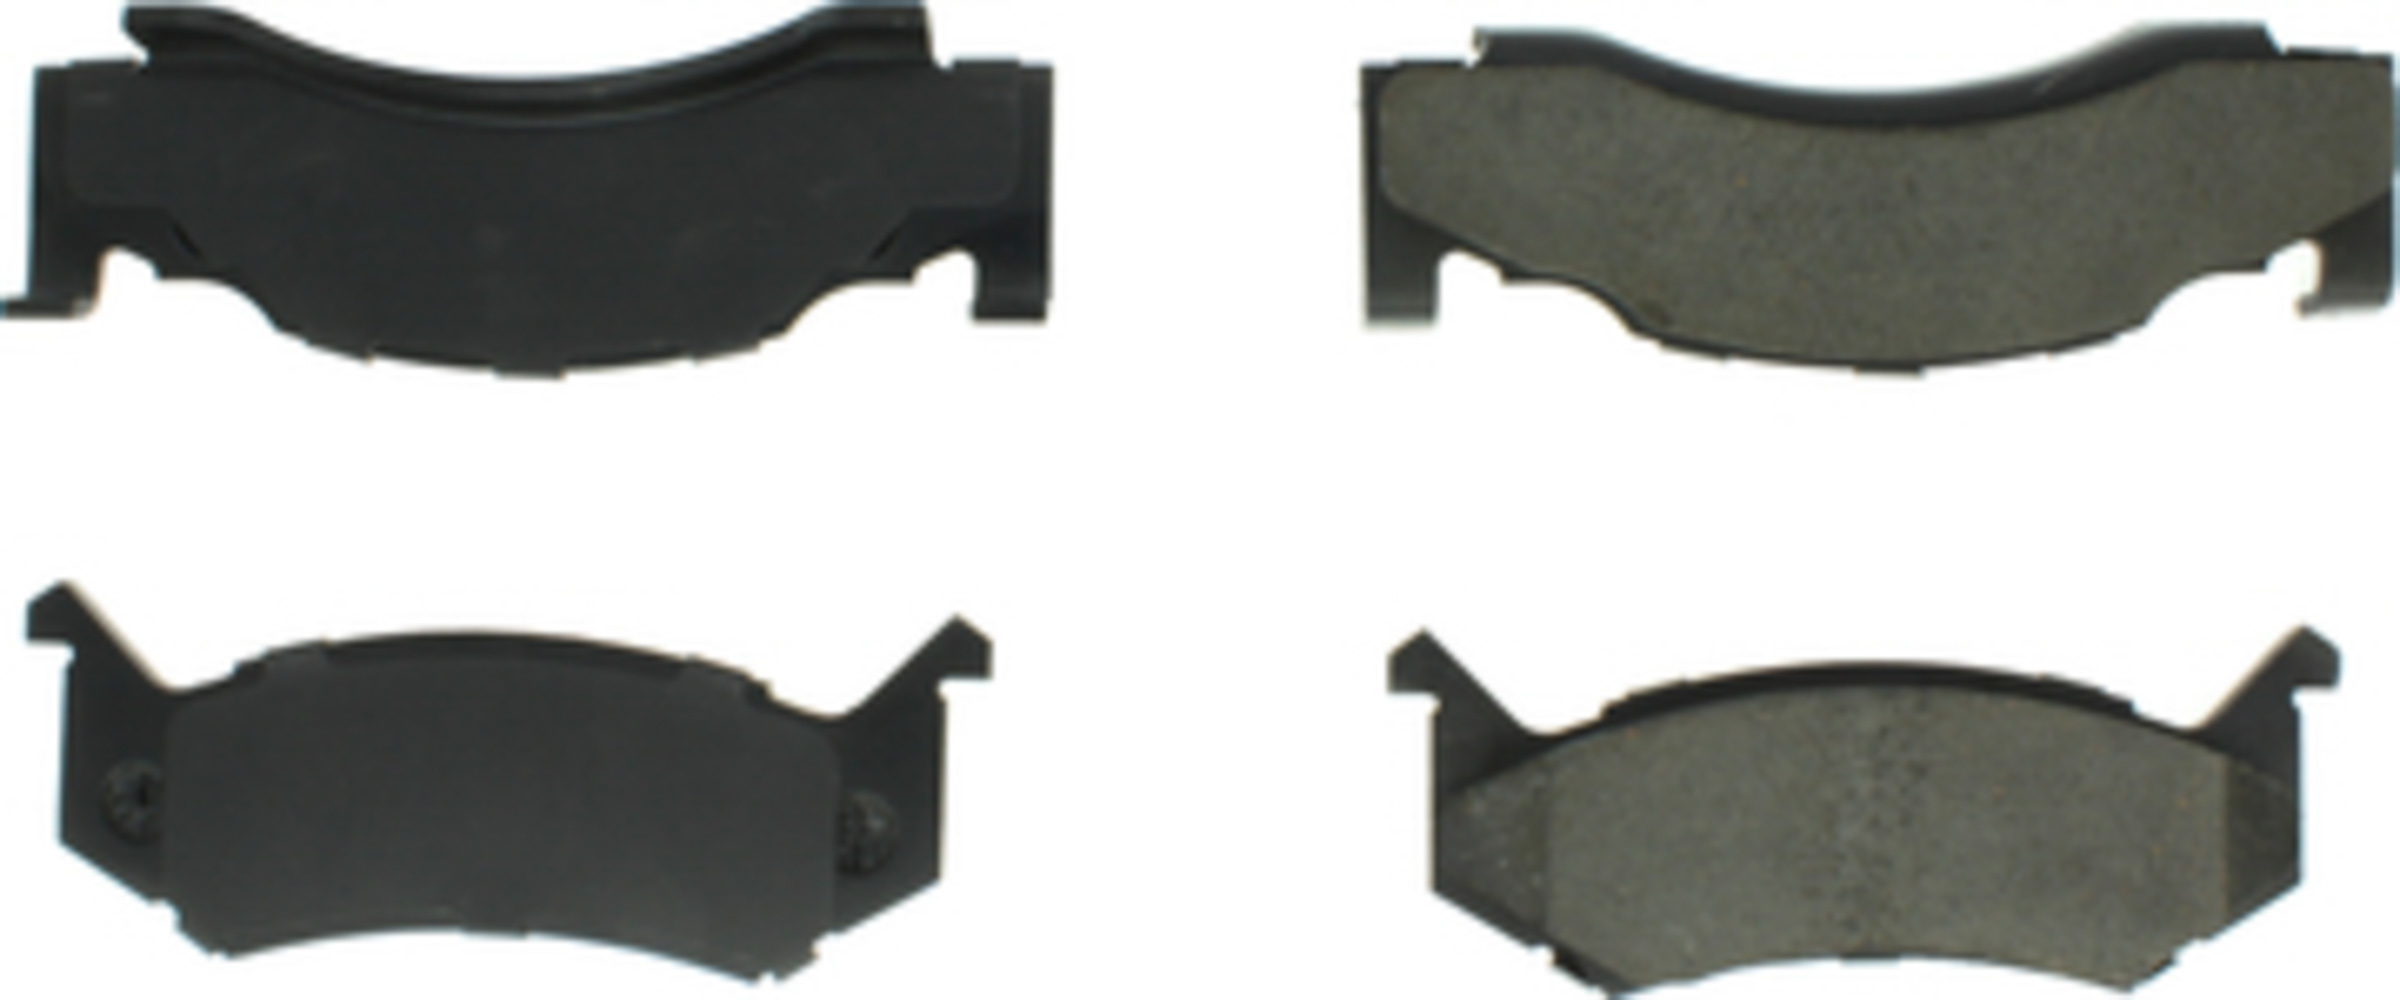 Centric Brake Parts 106.01230 Brake Pads, Posi-Quiet, Semi-Metallic, Shims / Hardware, Dodge Fullsize SUV 1982-97